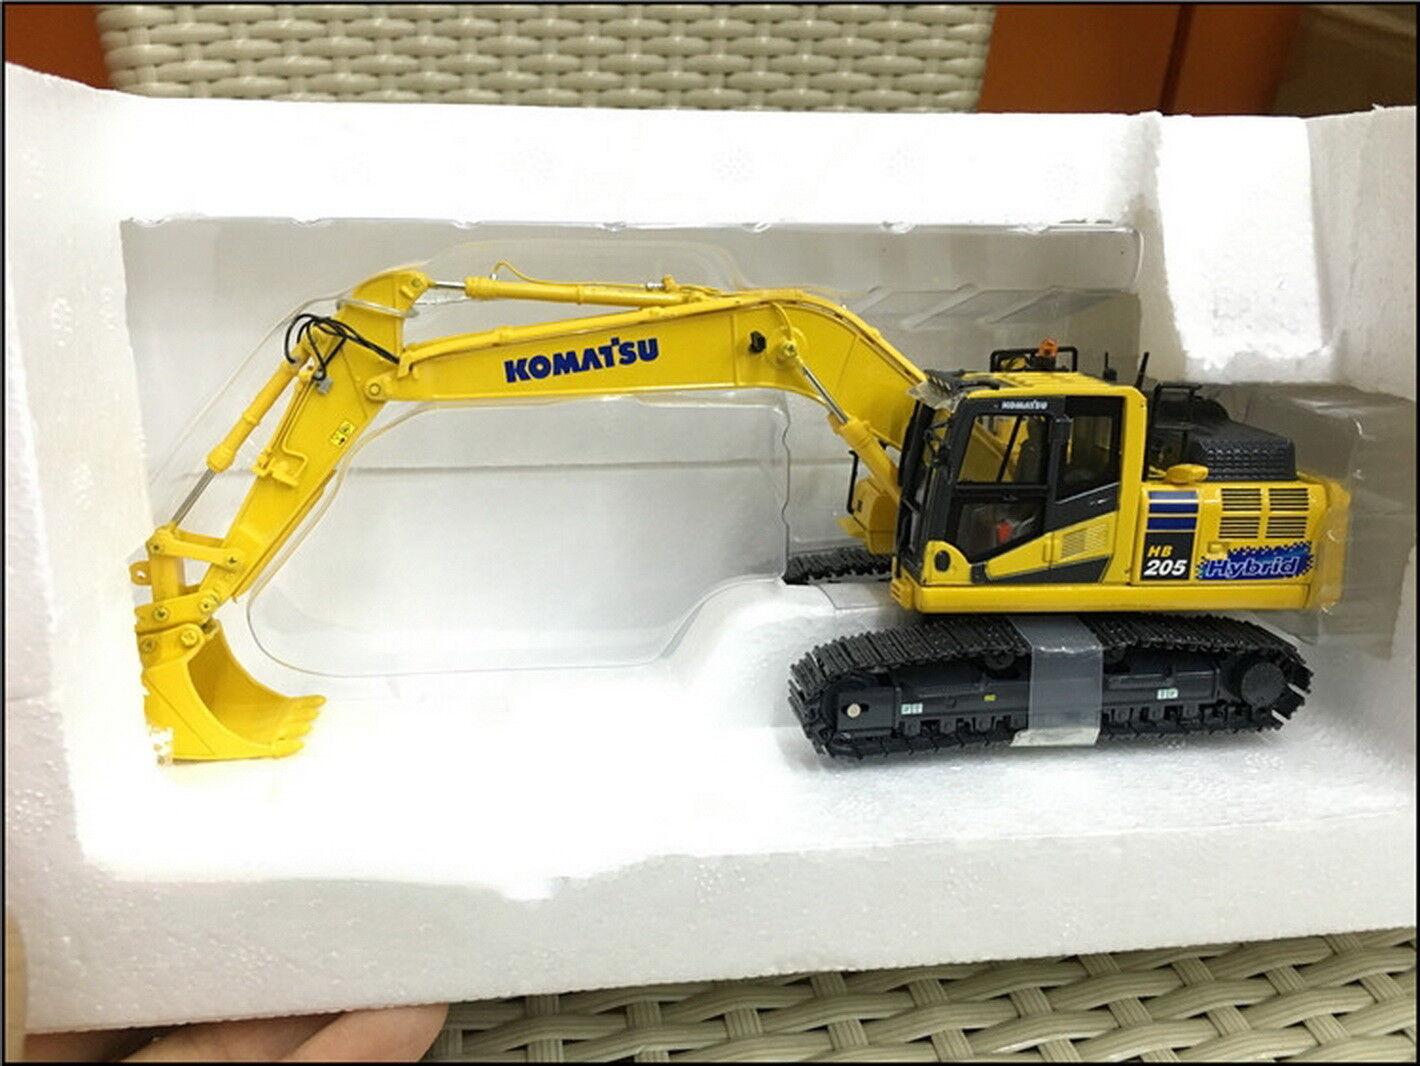 Universal Hobbies 1 50 Komatsu HB205 LC-3 Hybrid Excavator DieCast Model UH8136